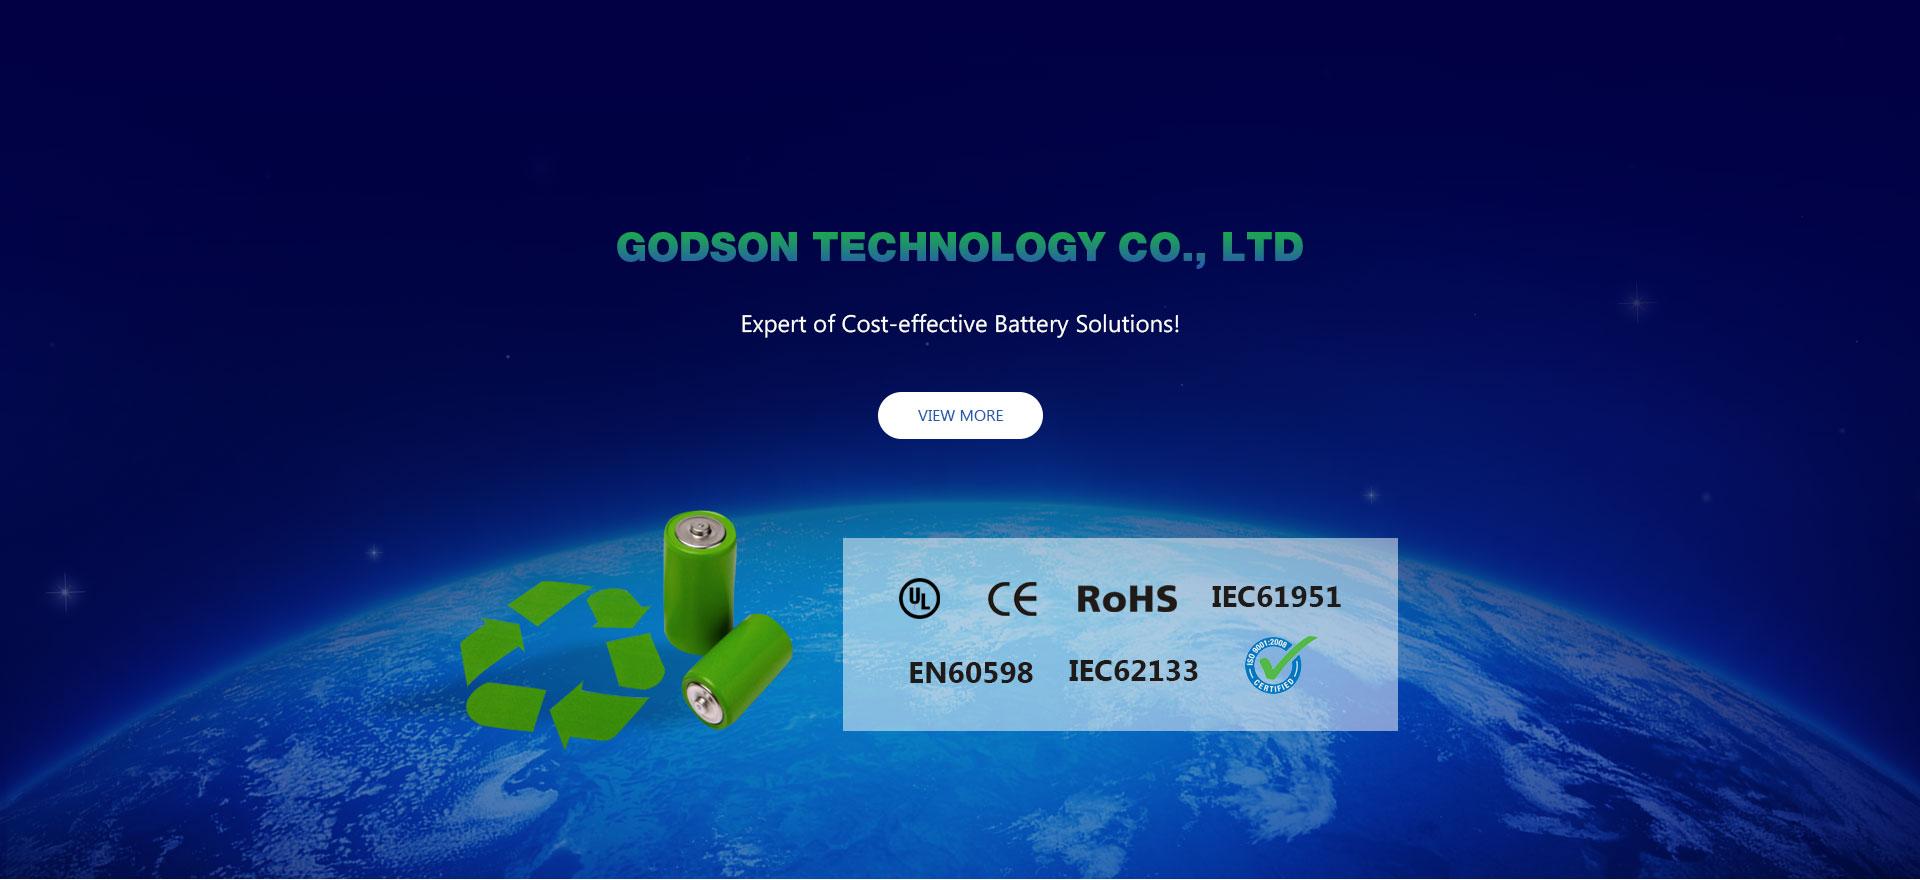 Godson Technology Co., Ltd.